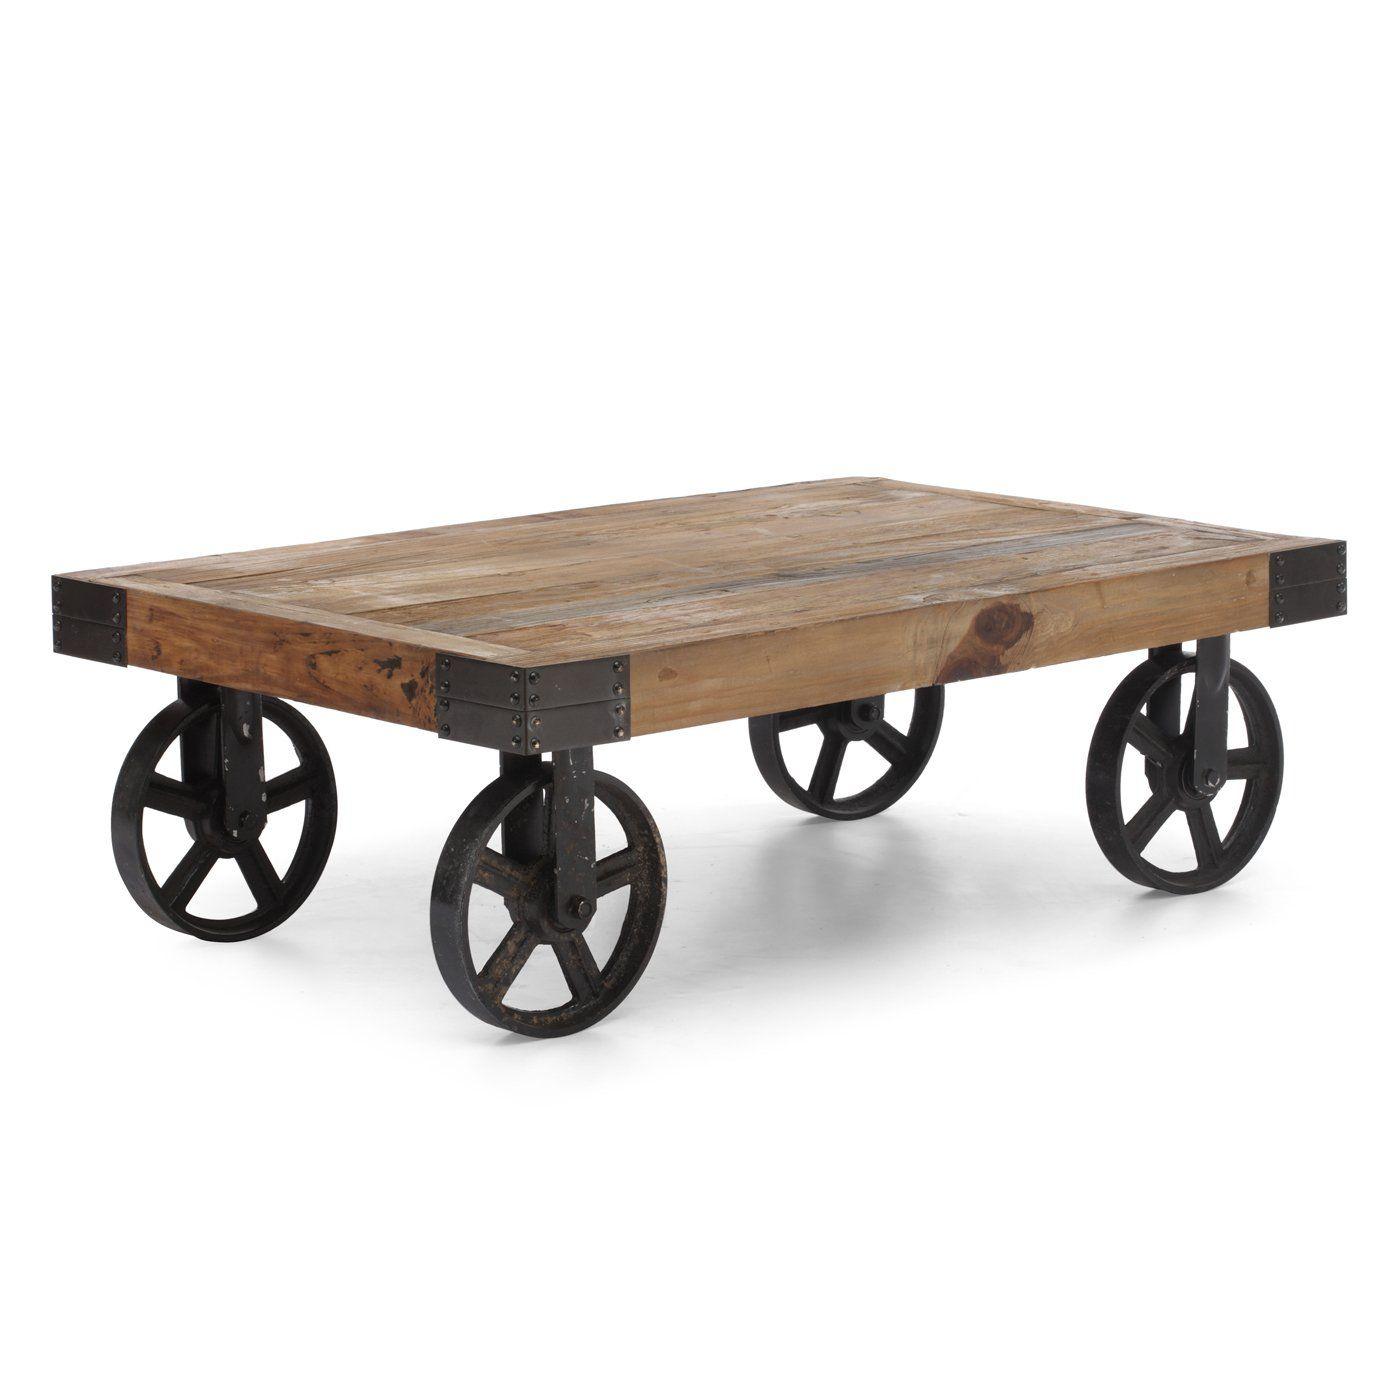 Zuo Modern 98130 Barbary Coast Cart Table | Lowe's Canada